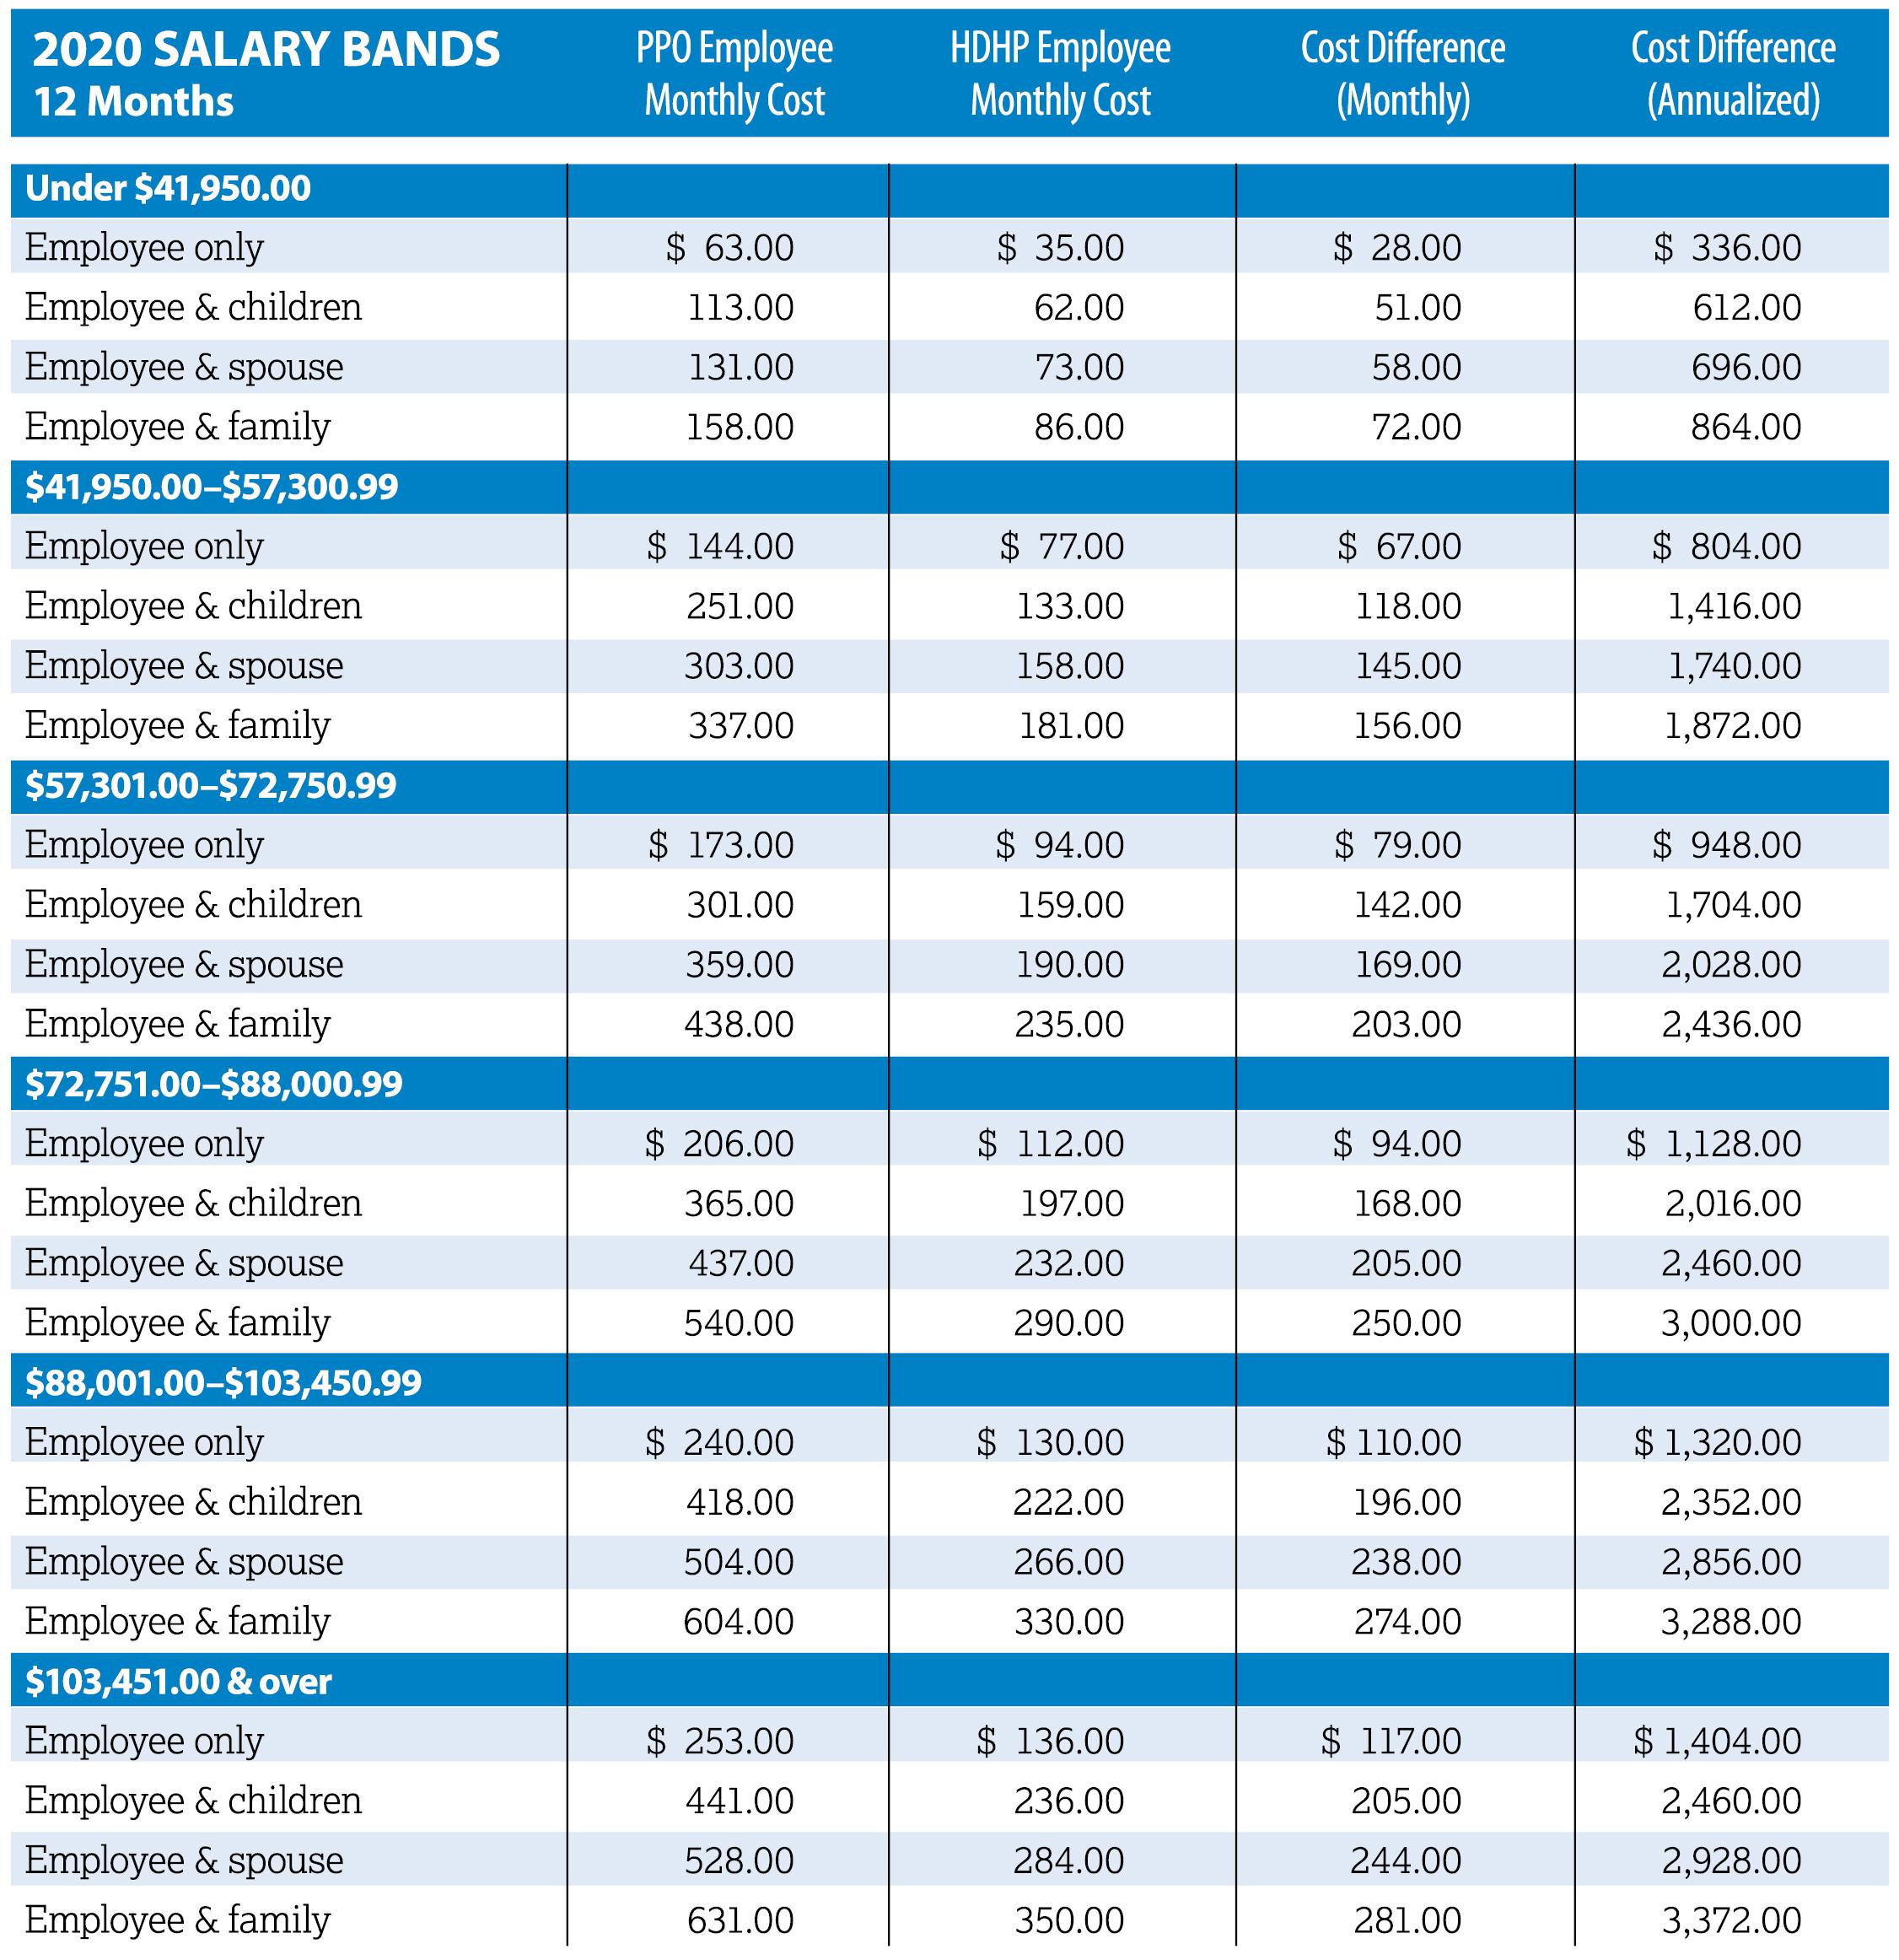 2020 Premium Schedules | Human Resources | Baylor University